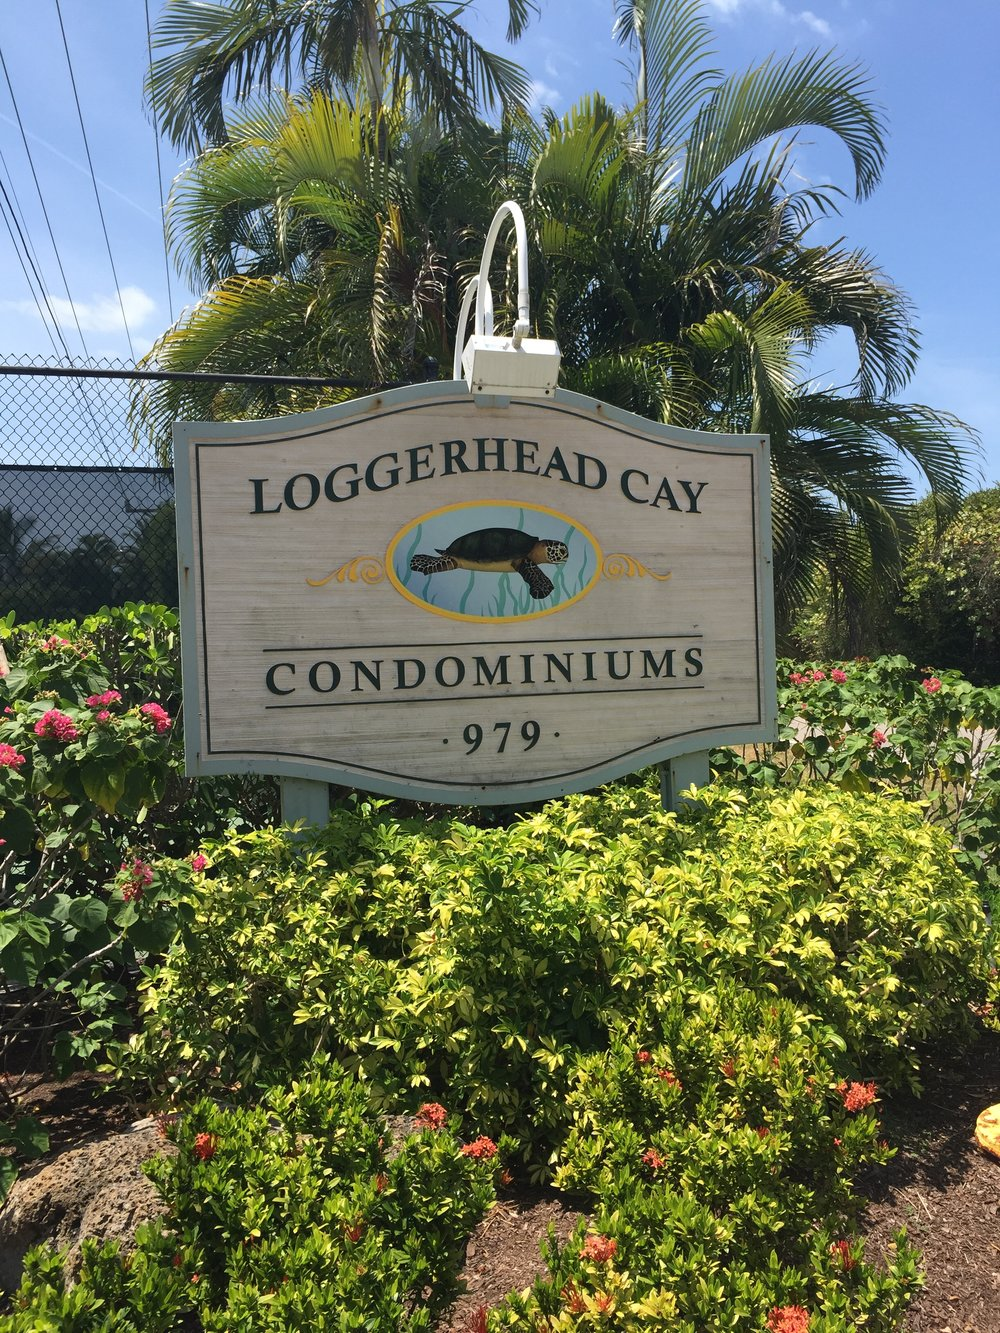 Entrance to Loggerhead Cay Condo.JPG